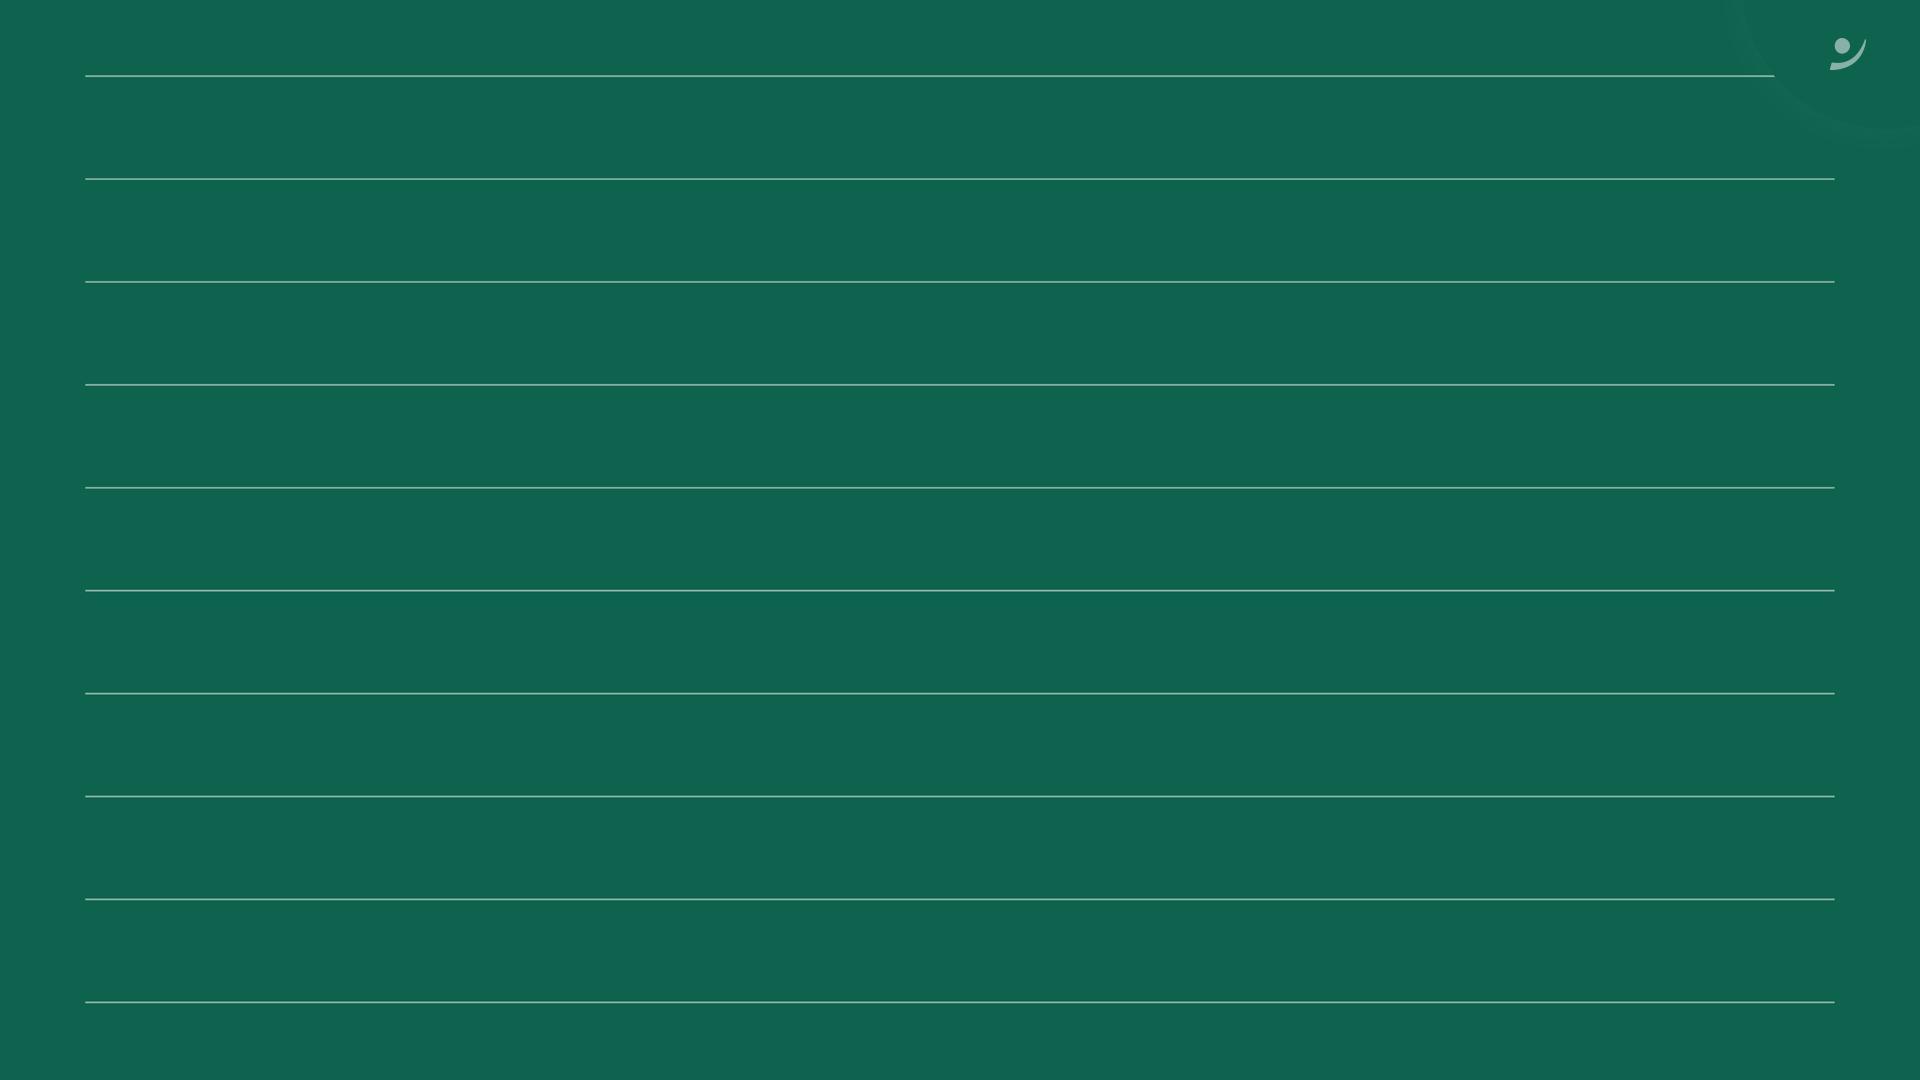 Klasse 4 grün -